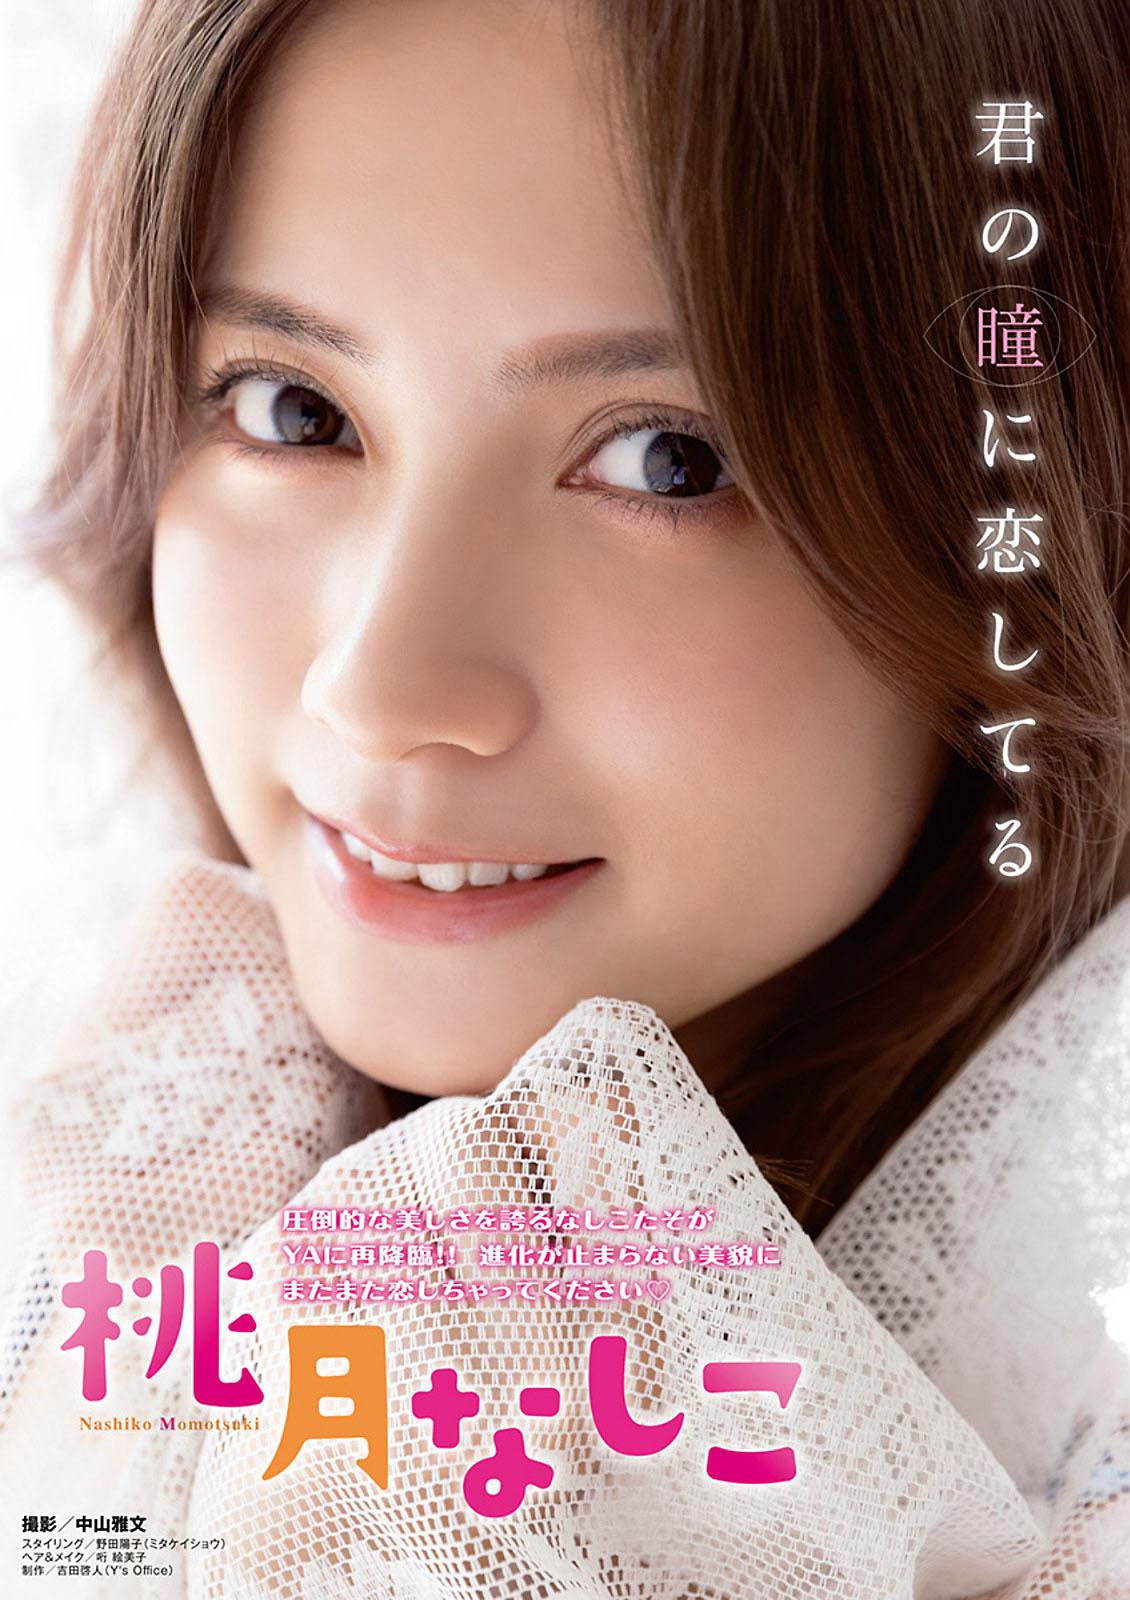 Nashiko Momotsuki Young Animal 211022 02.jpg